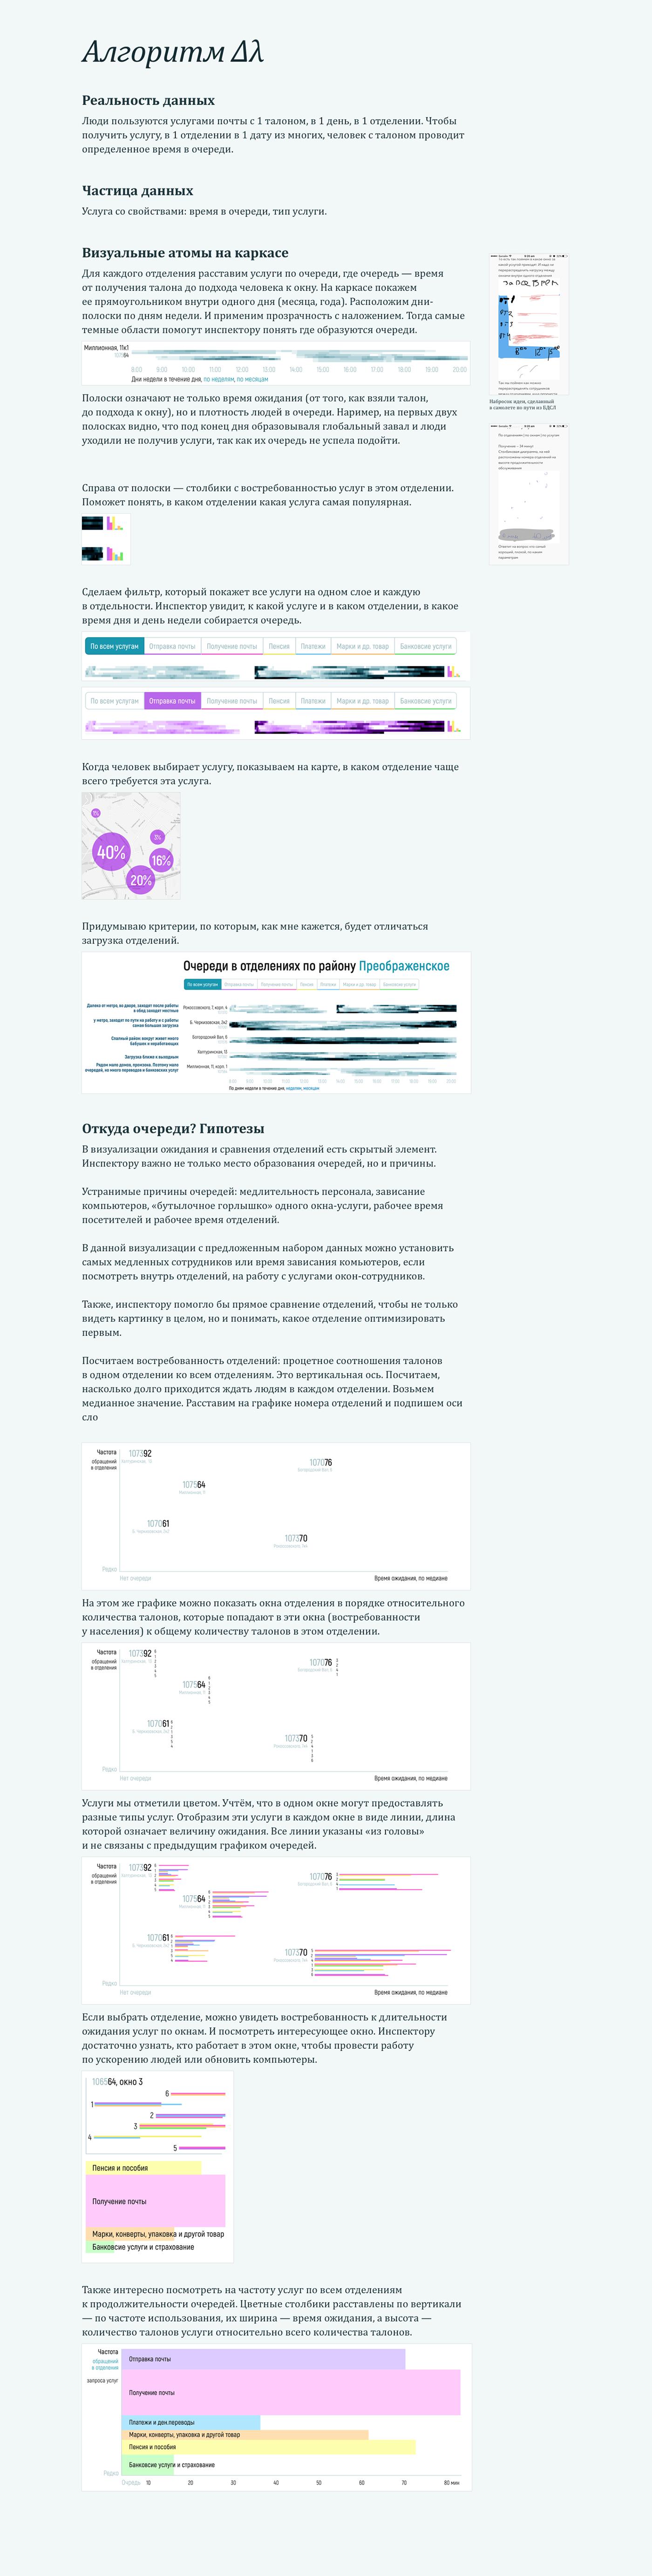 Data analitics data design exel dataviz visualization table post office